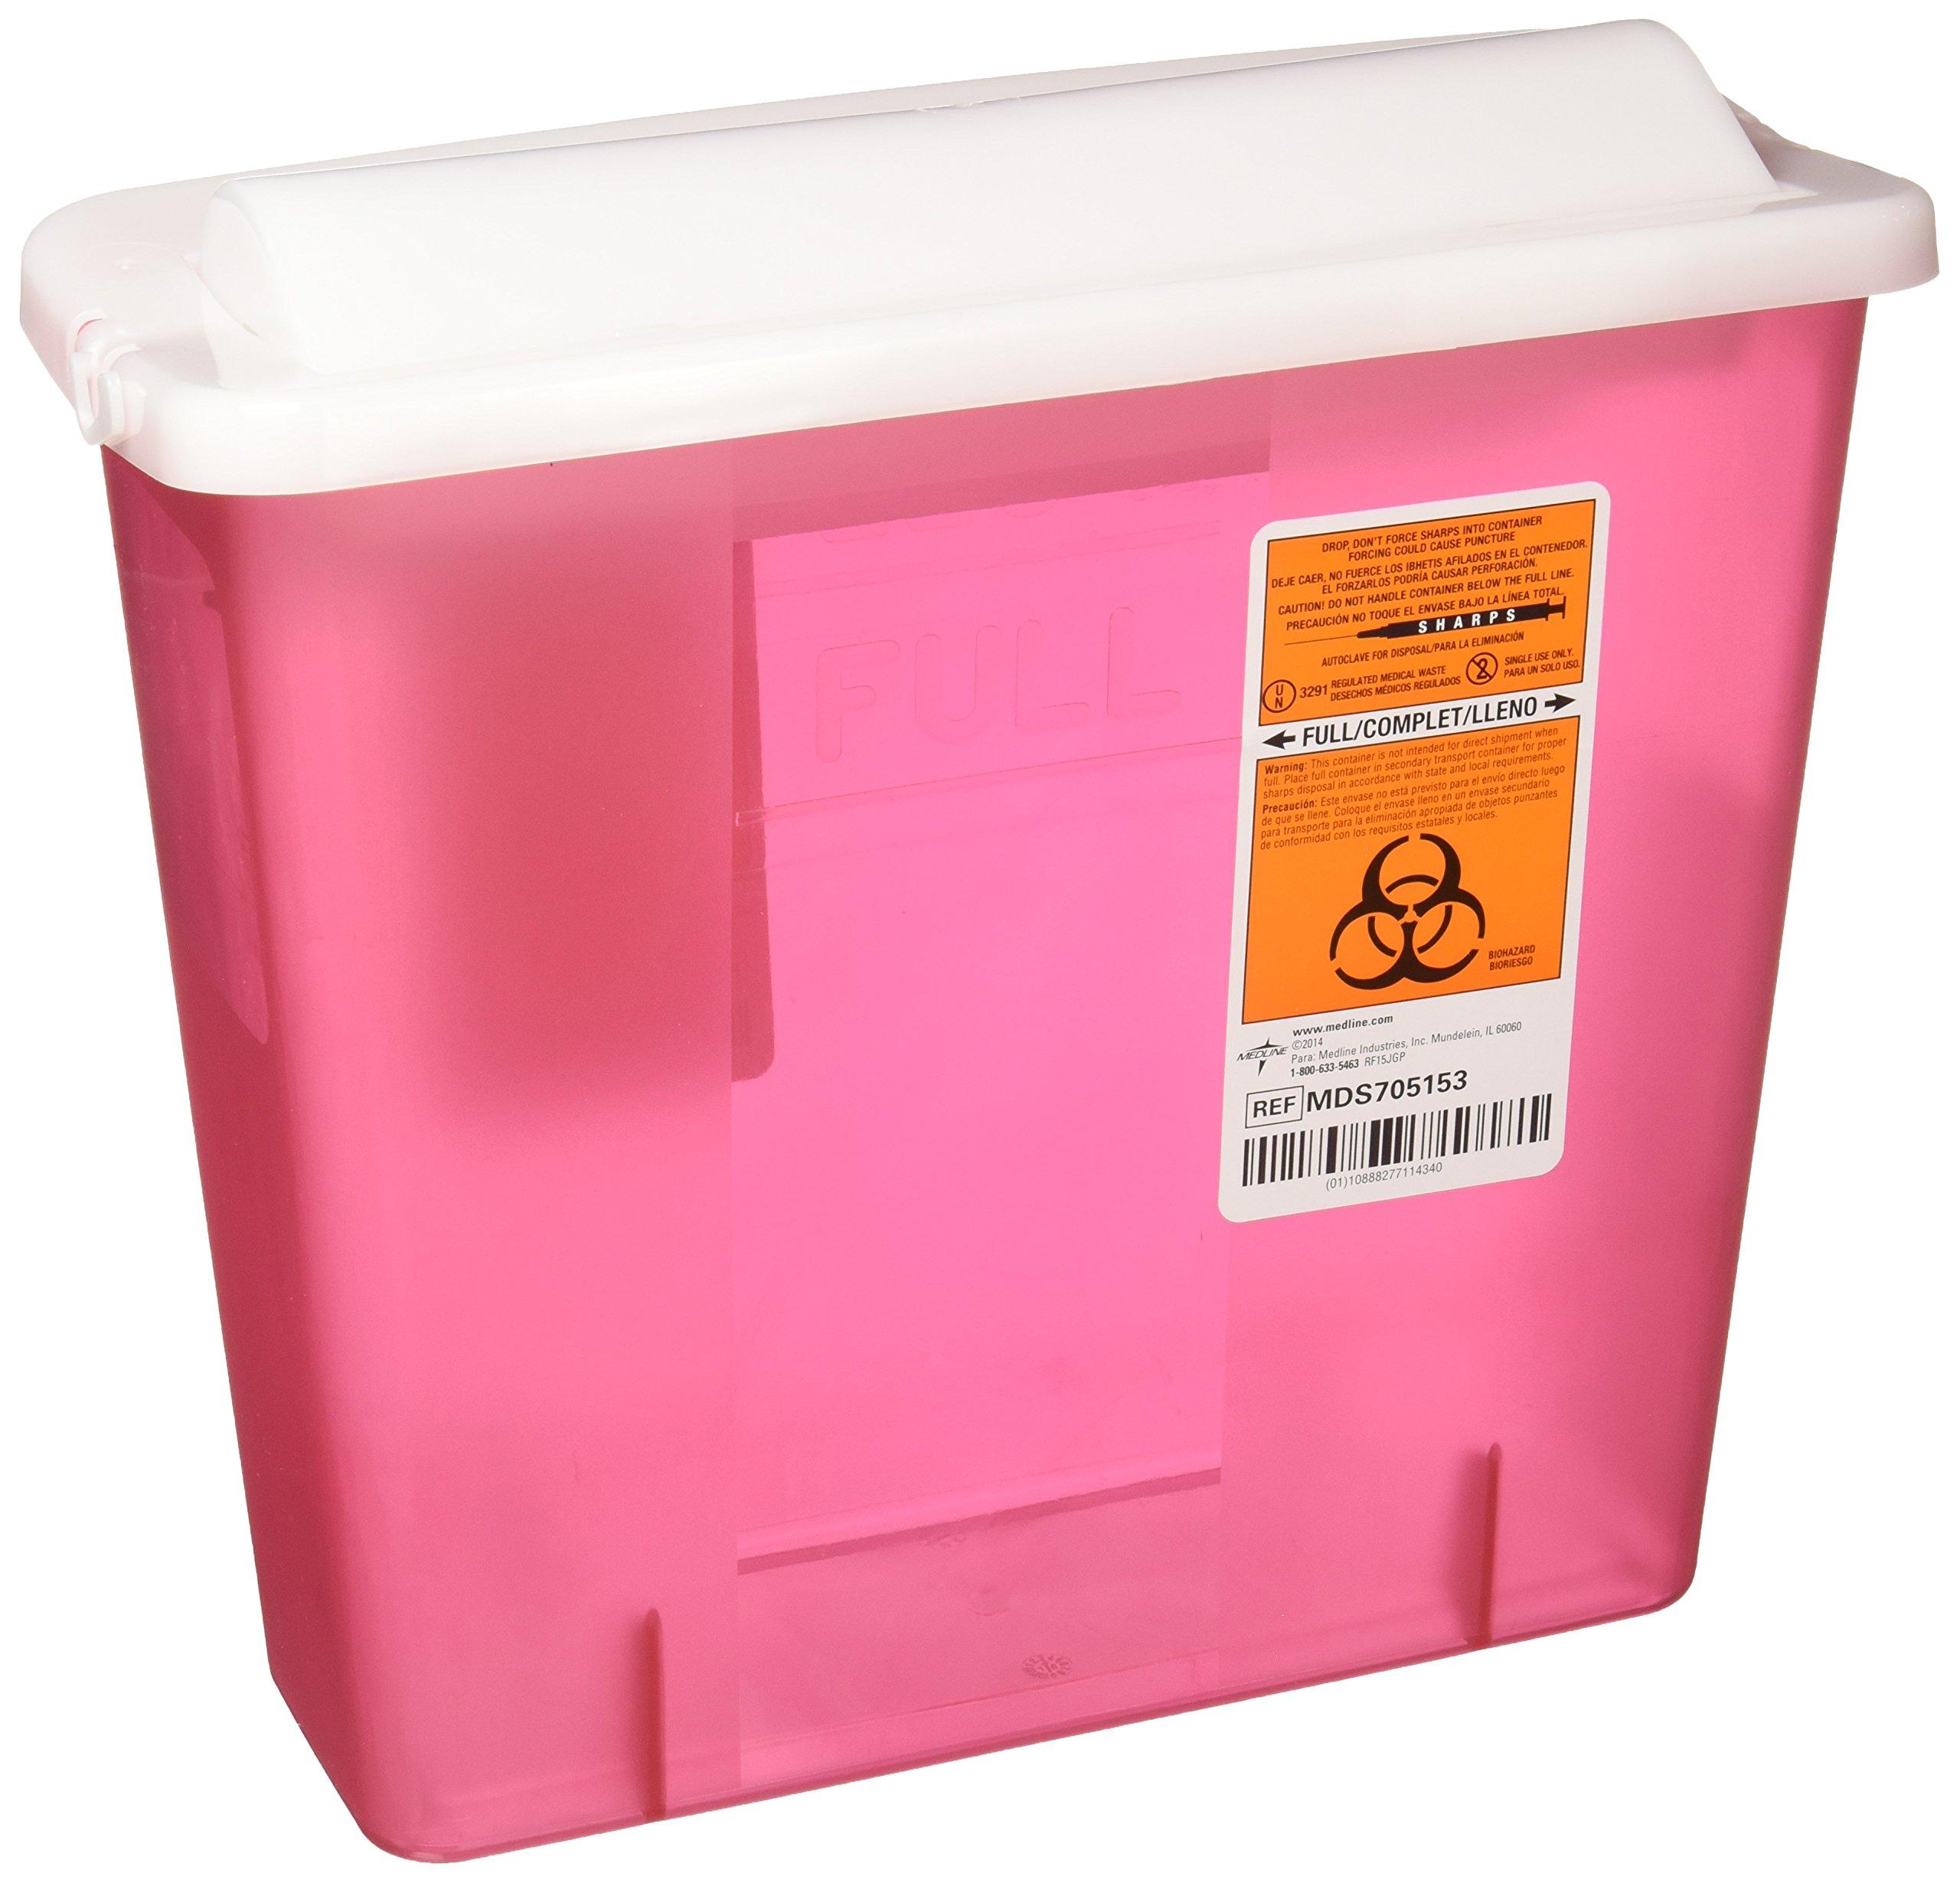 Medline MDS705153 Sharps Container, 5 Quart, Counter-Balance Lid, Red (Pack of 20) by Medline